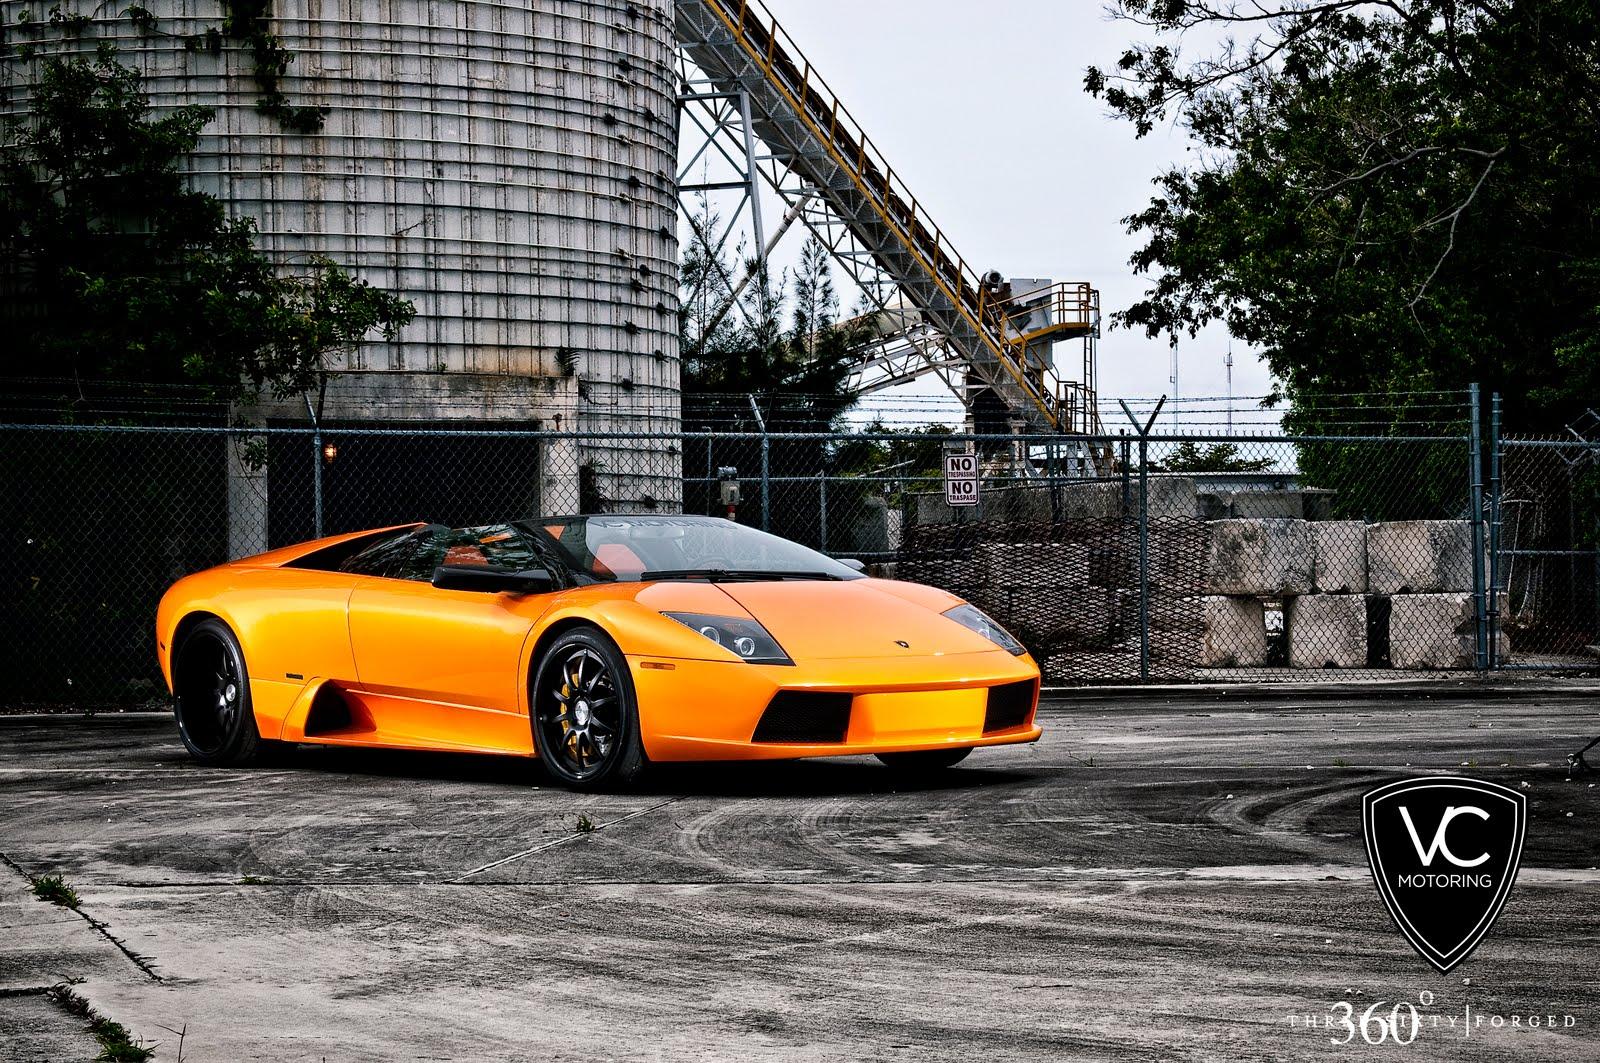 Lamborghini Murcielago VC